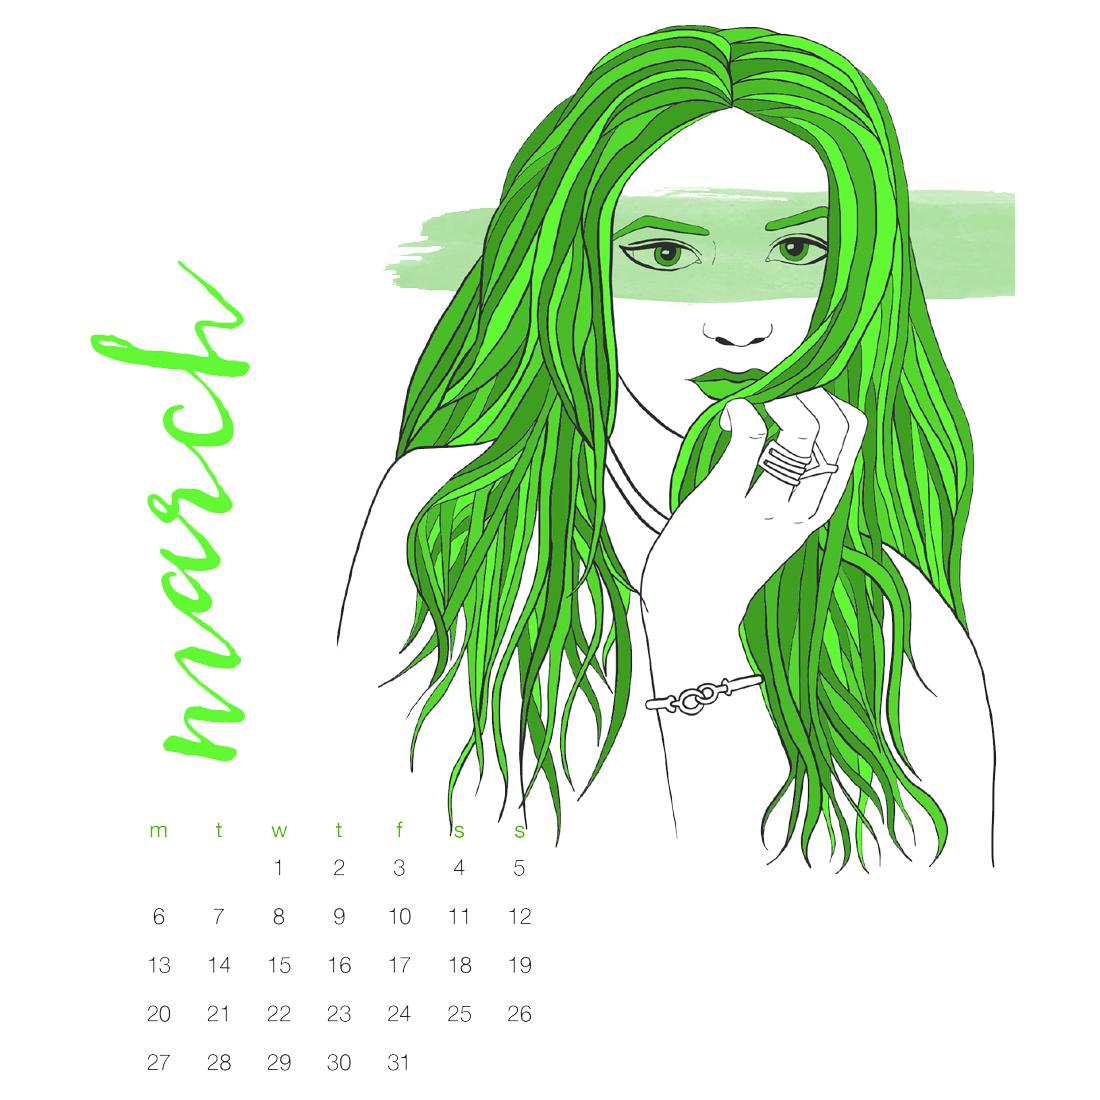 2017 Illustrated Fashion Illustration Calendar